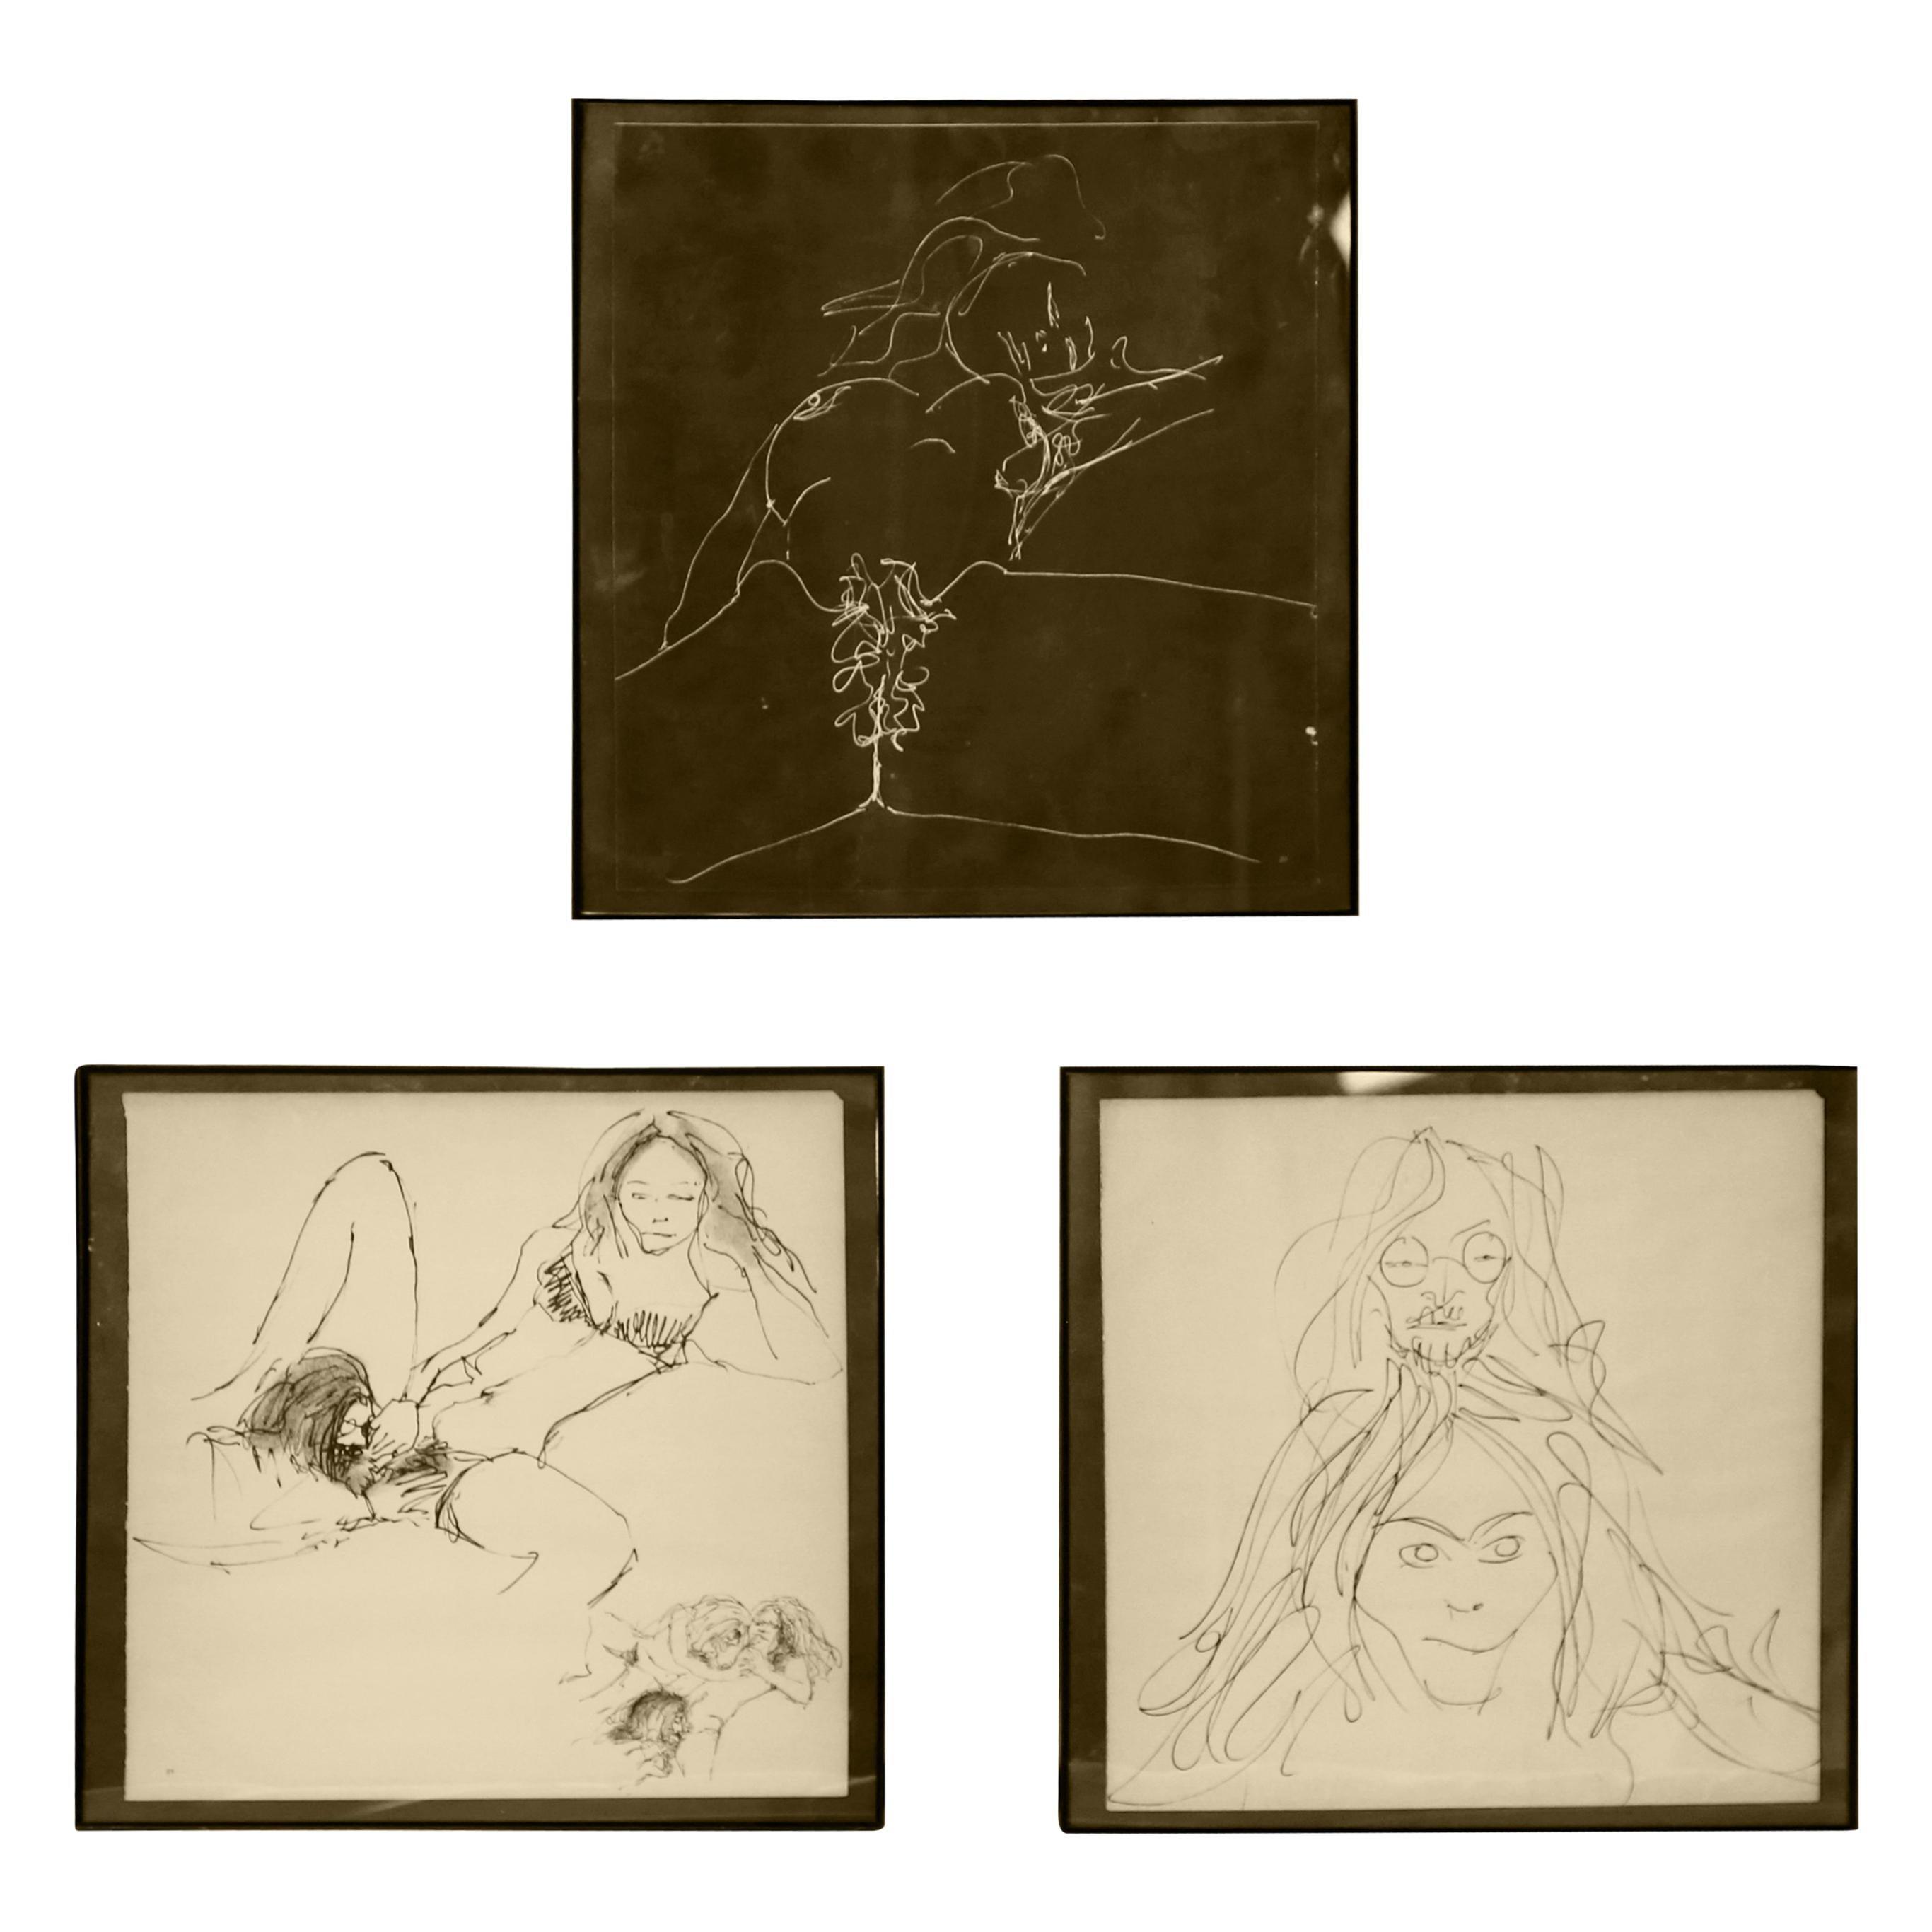 Three Erotic Lithographs by John Lennon